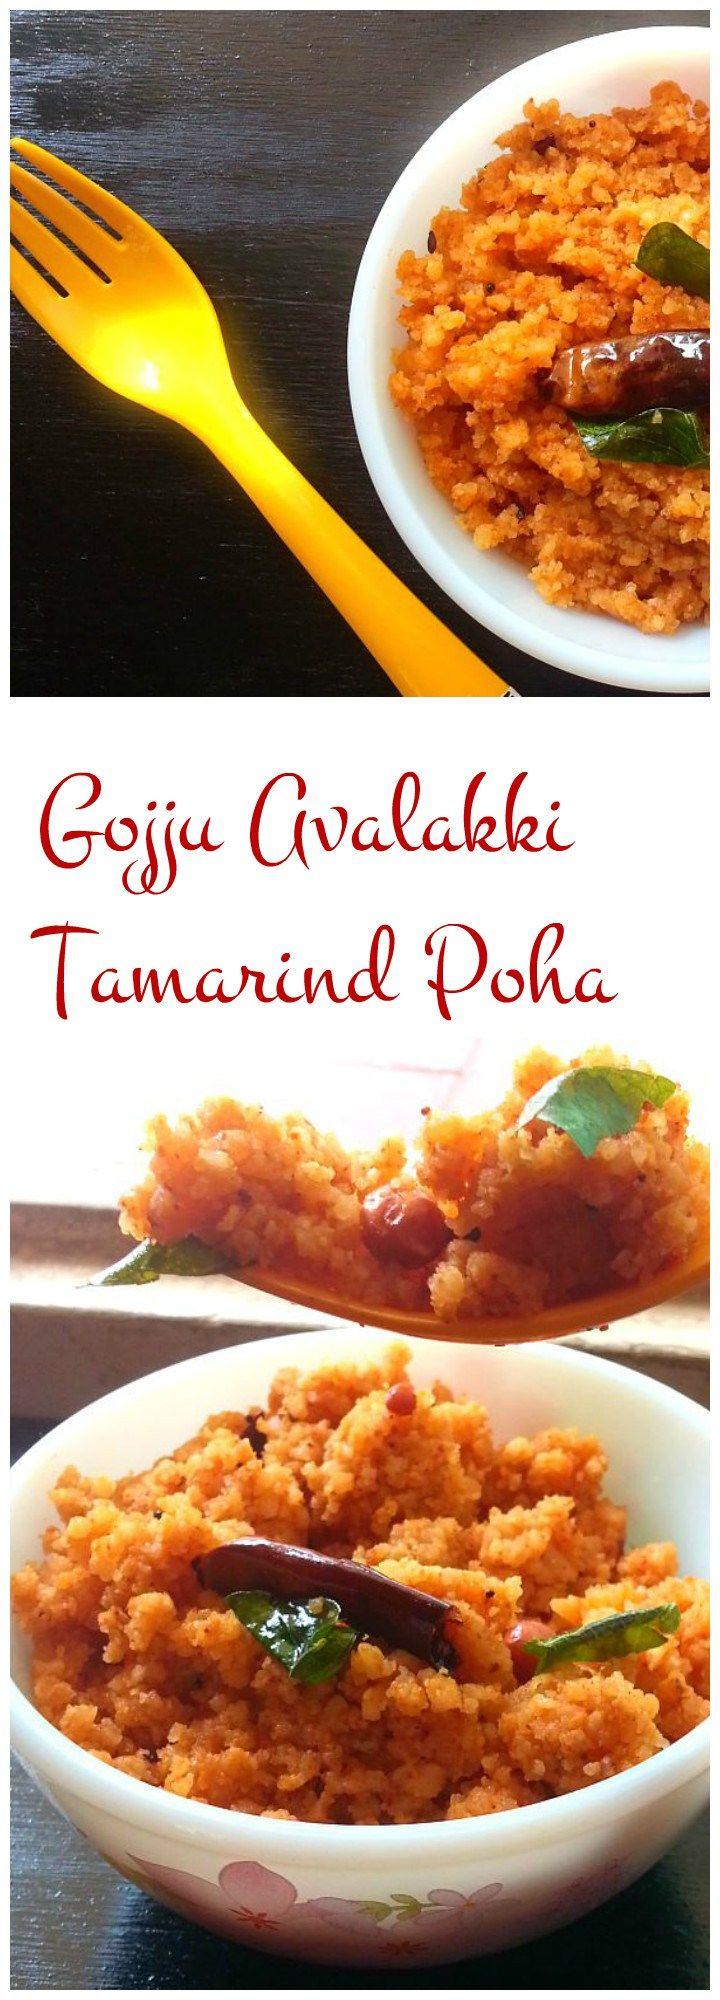 Gojju Avalakki – One of the famous Karnataka Recipes often eaten as breakfast and during fasting.